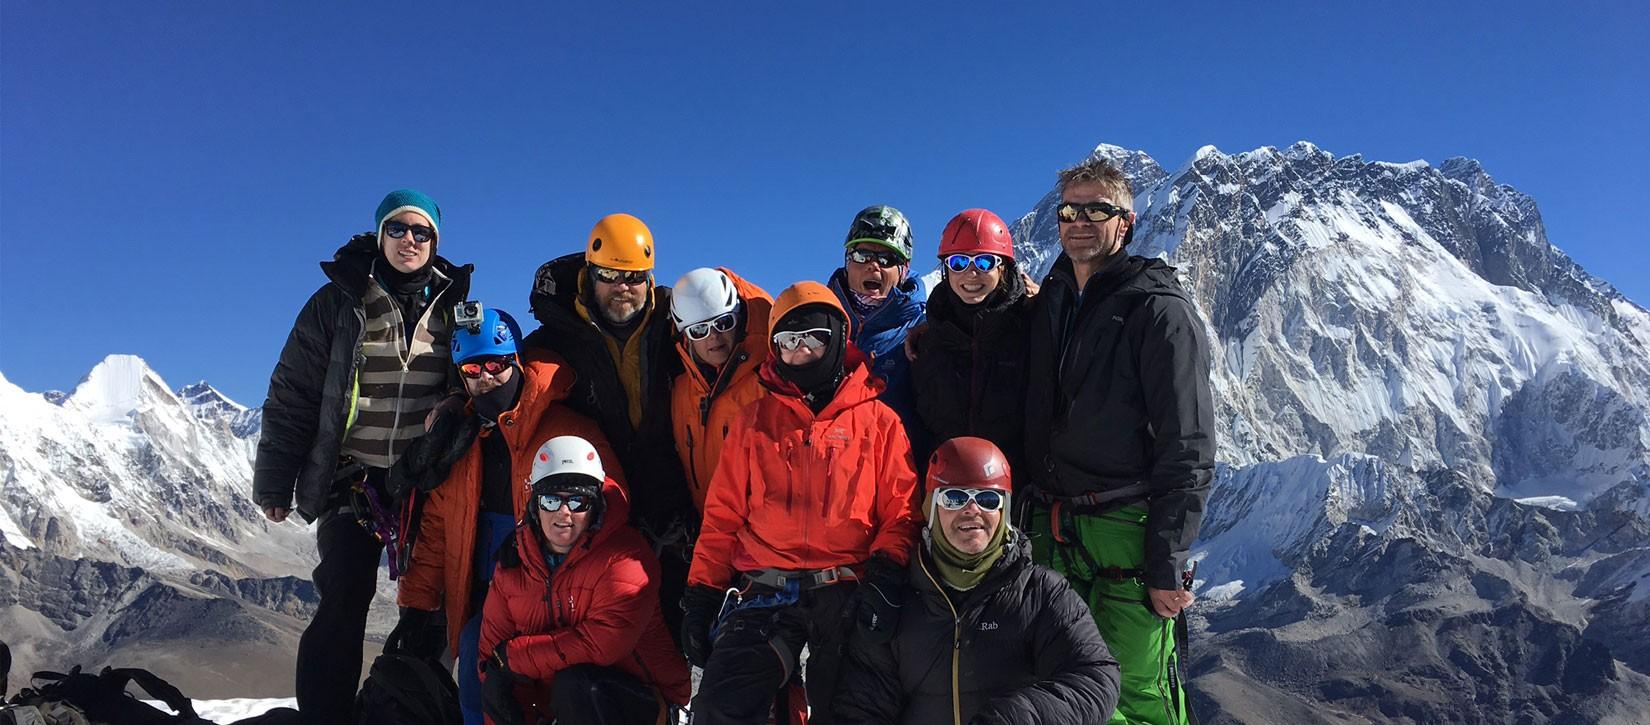 Lobouche Peak